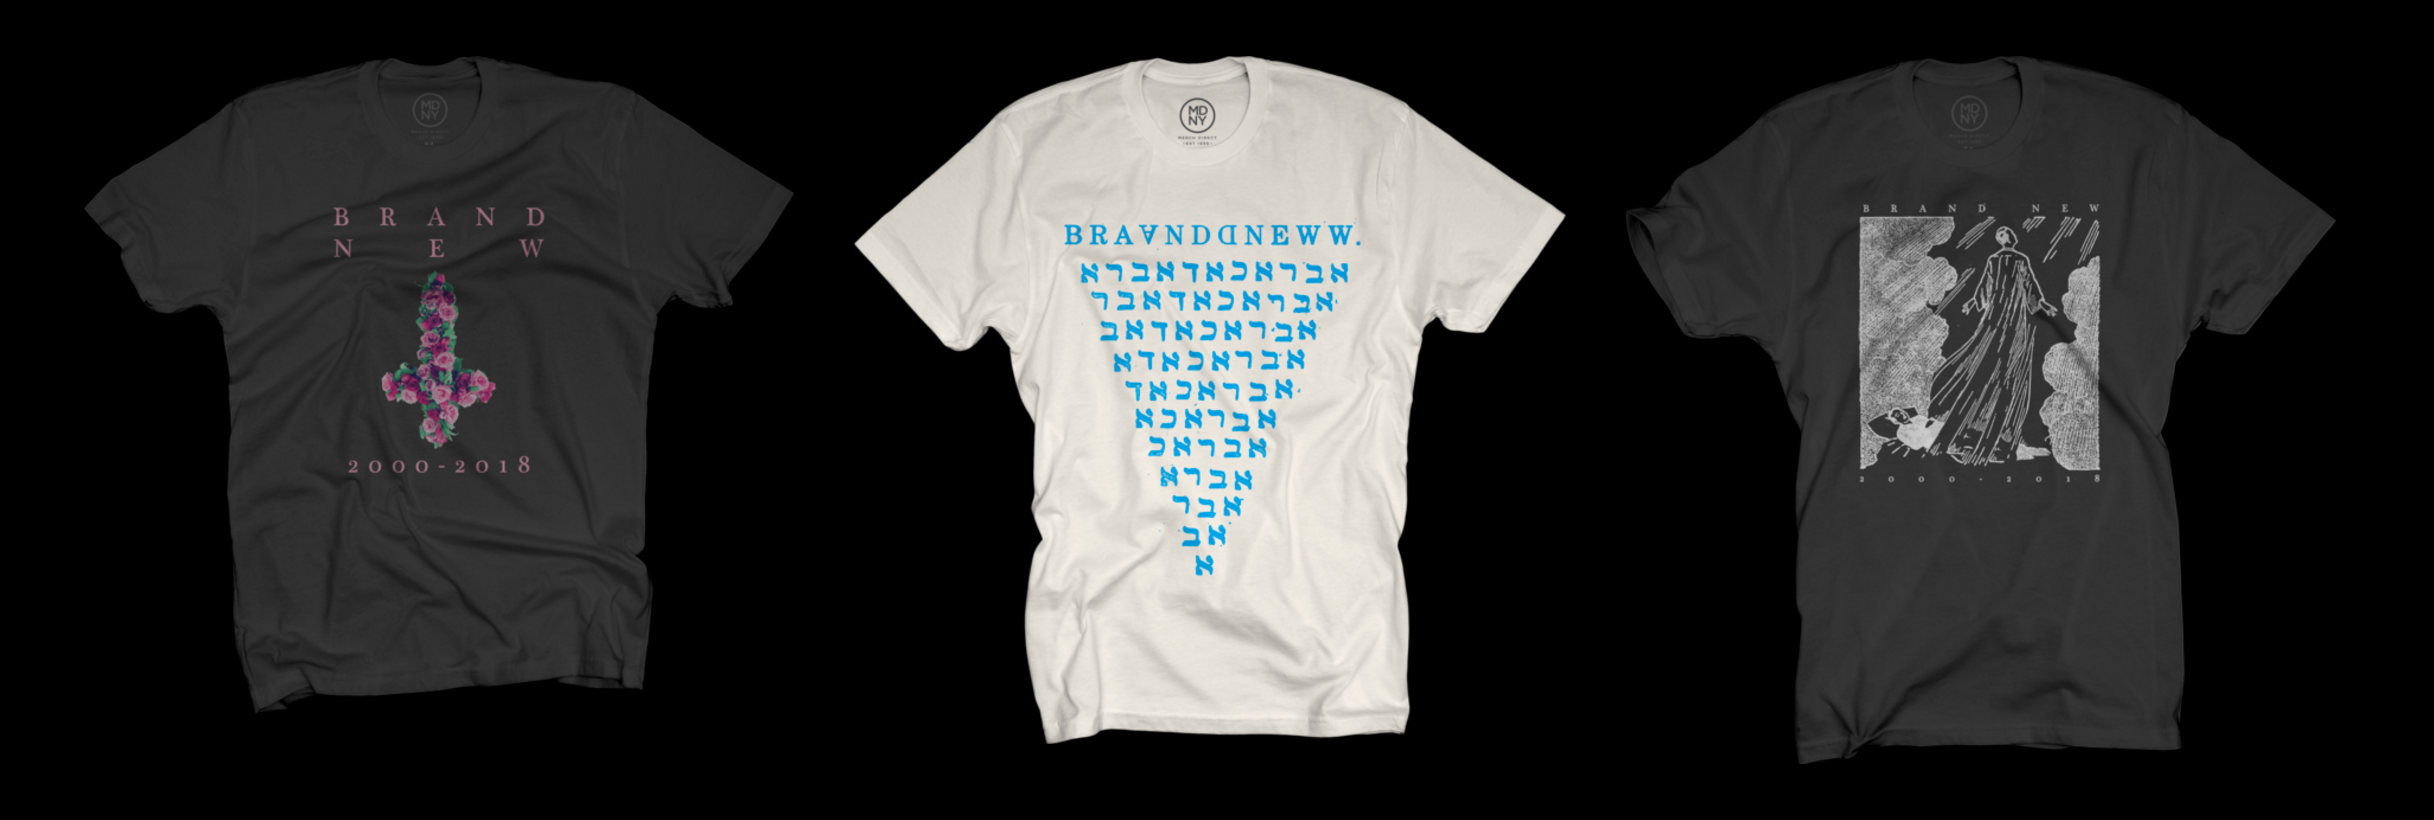 Brand-New-T-Shirts